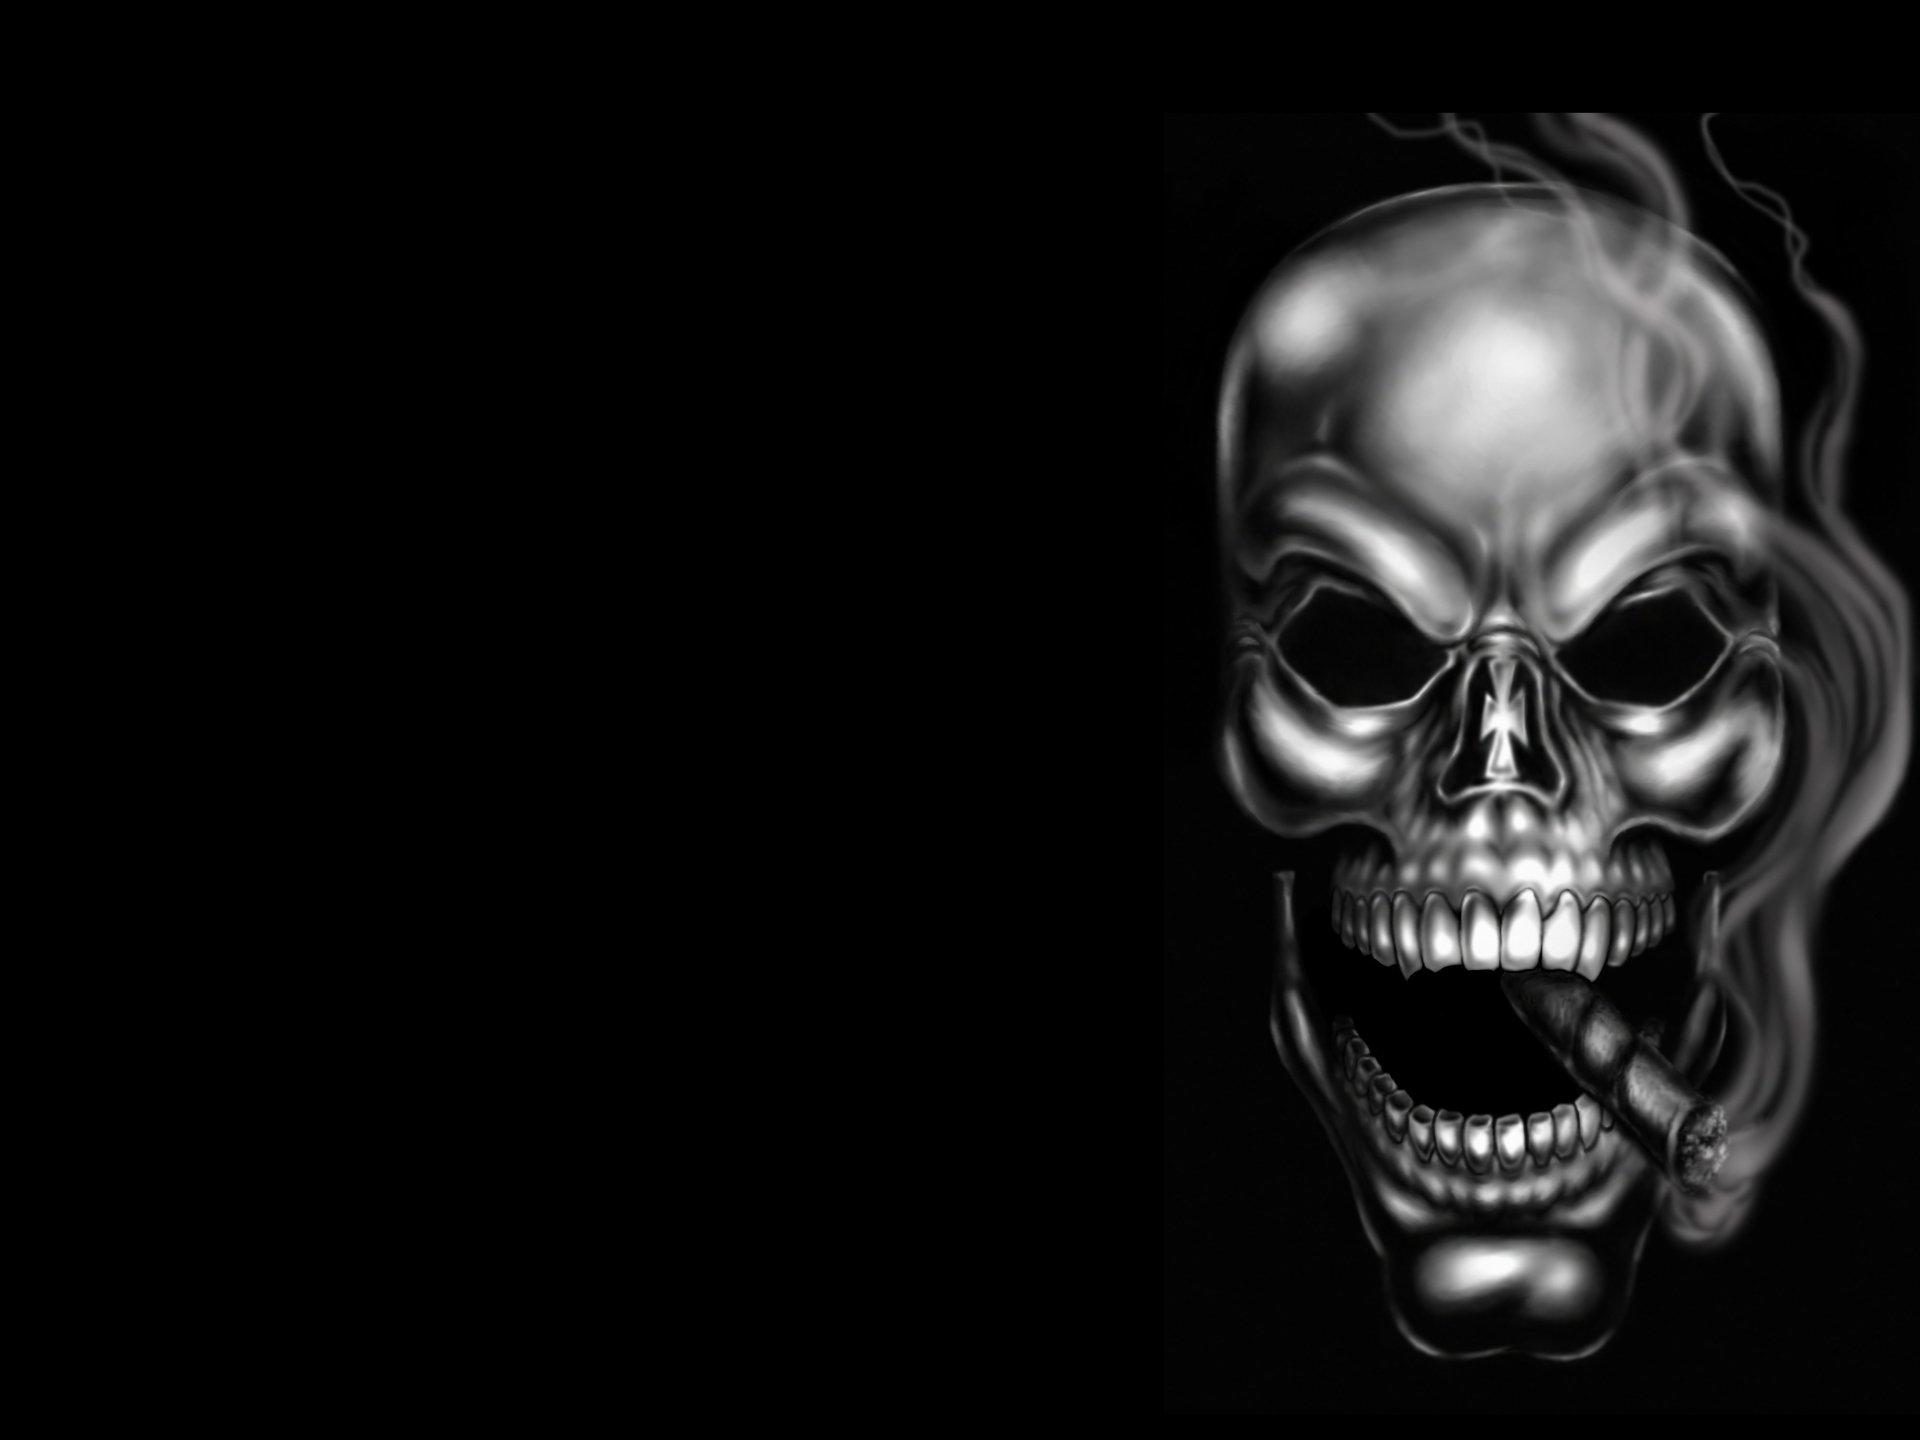 Skull 4k ultra hd wallpaper and background image - Skull 4k images ...